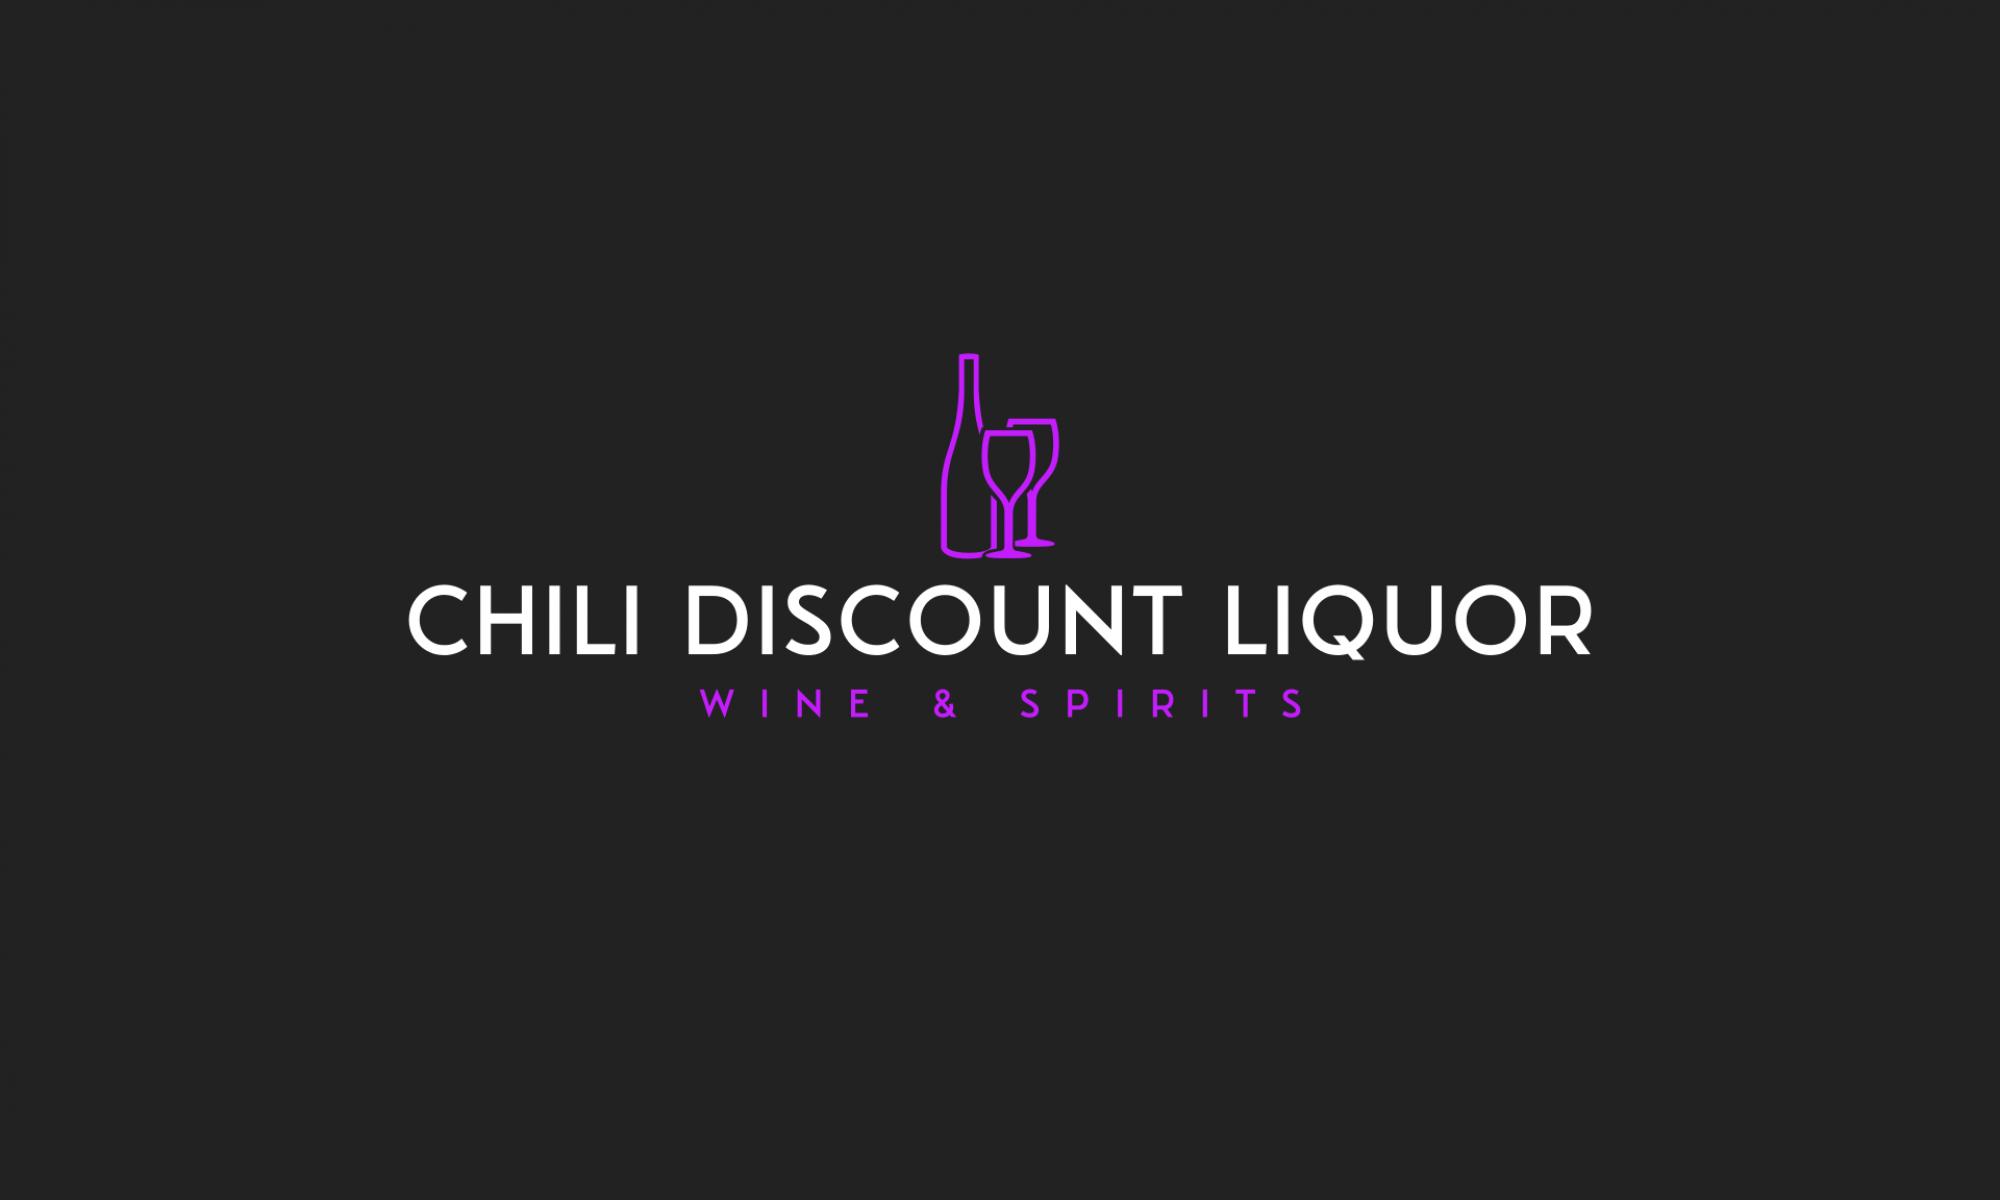 Chili Liquor